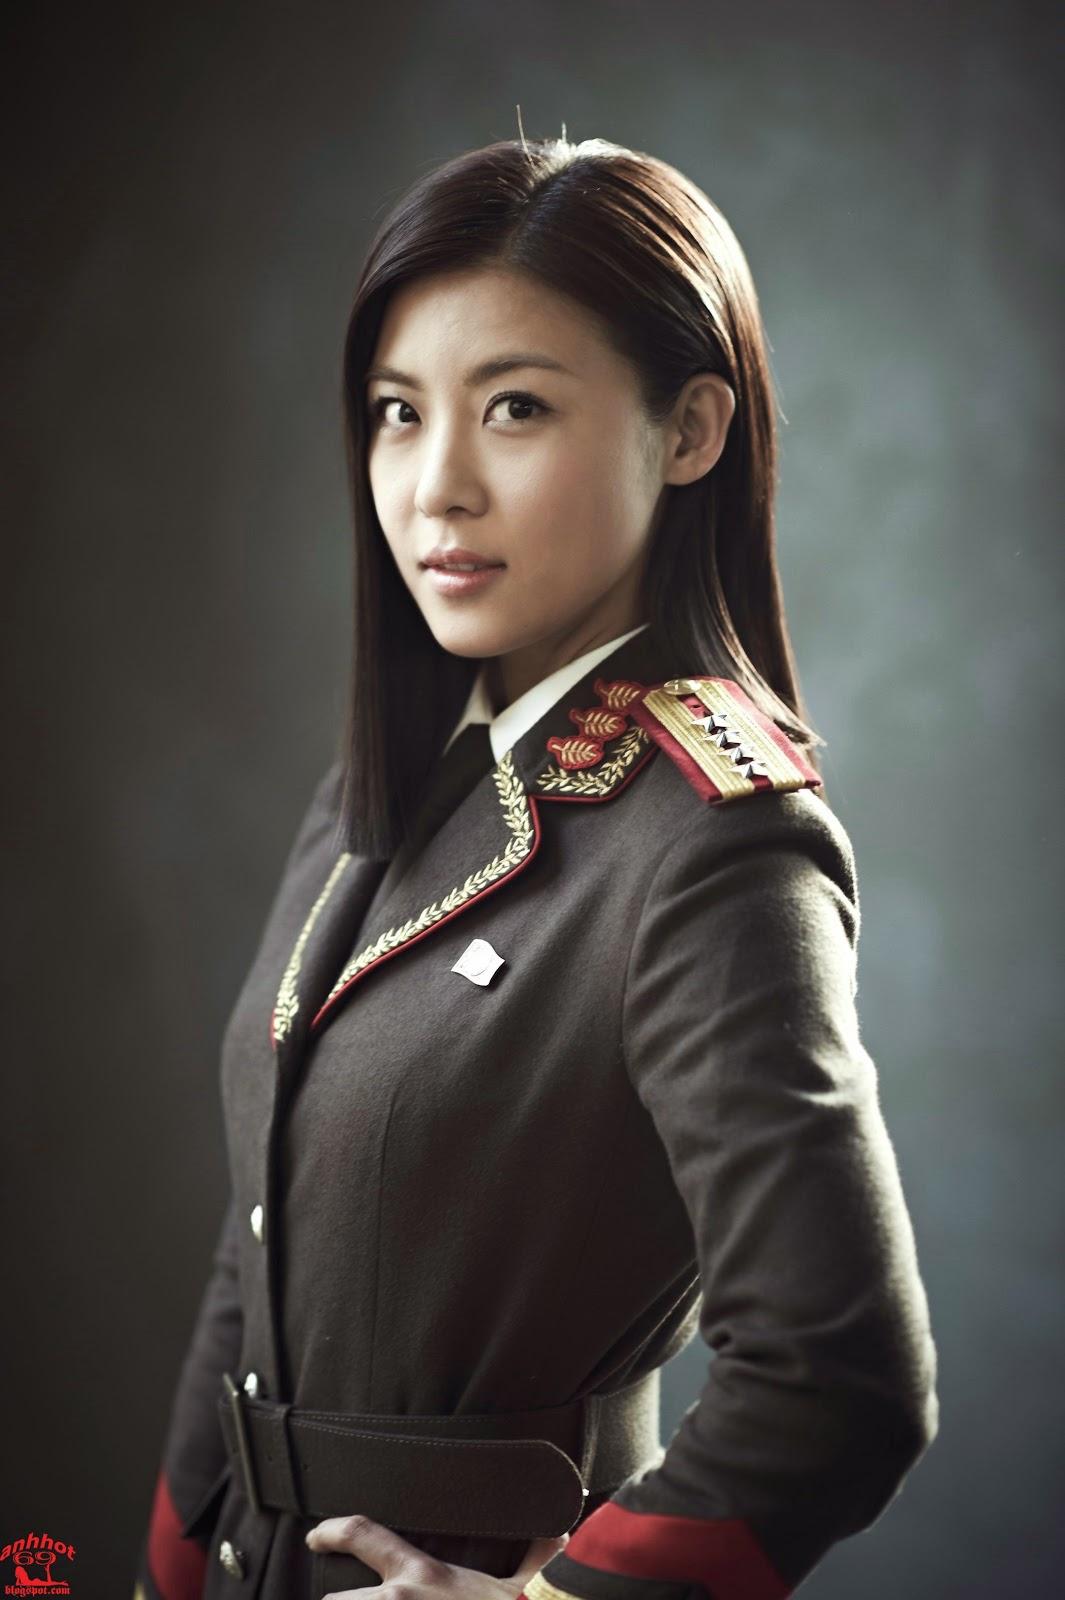 Kpop-Start-Hot_atrIV